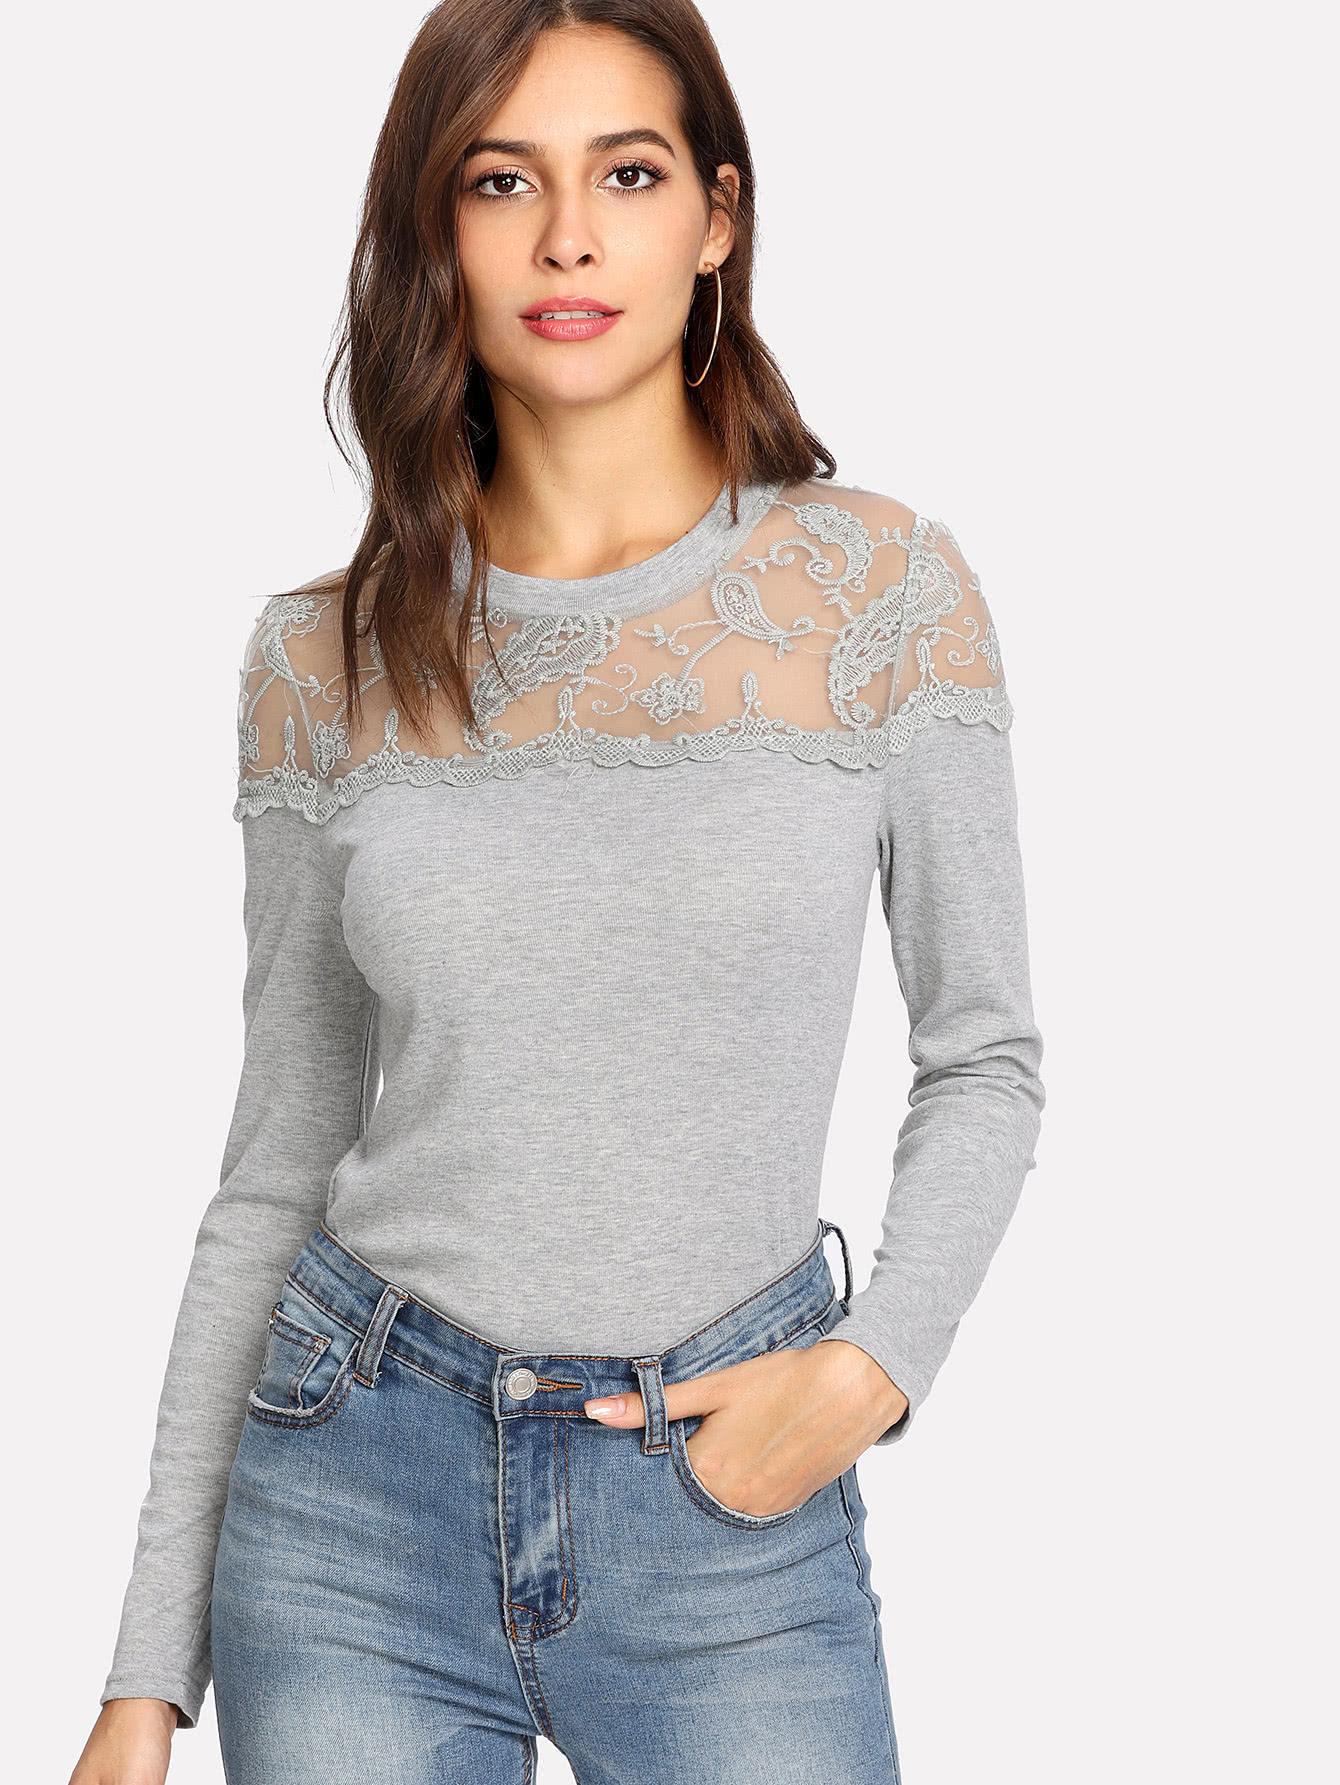 Embroidered Mesh Yoke Heather Knit Tee mesh trim heather knit tee